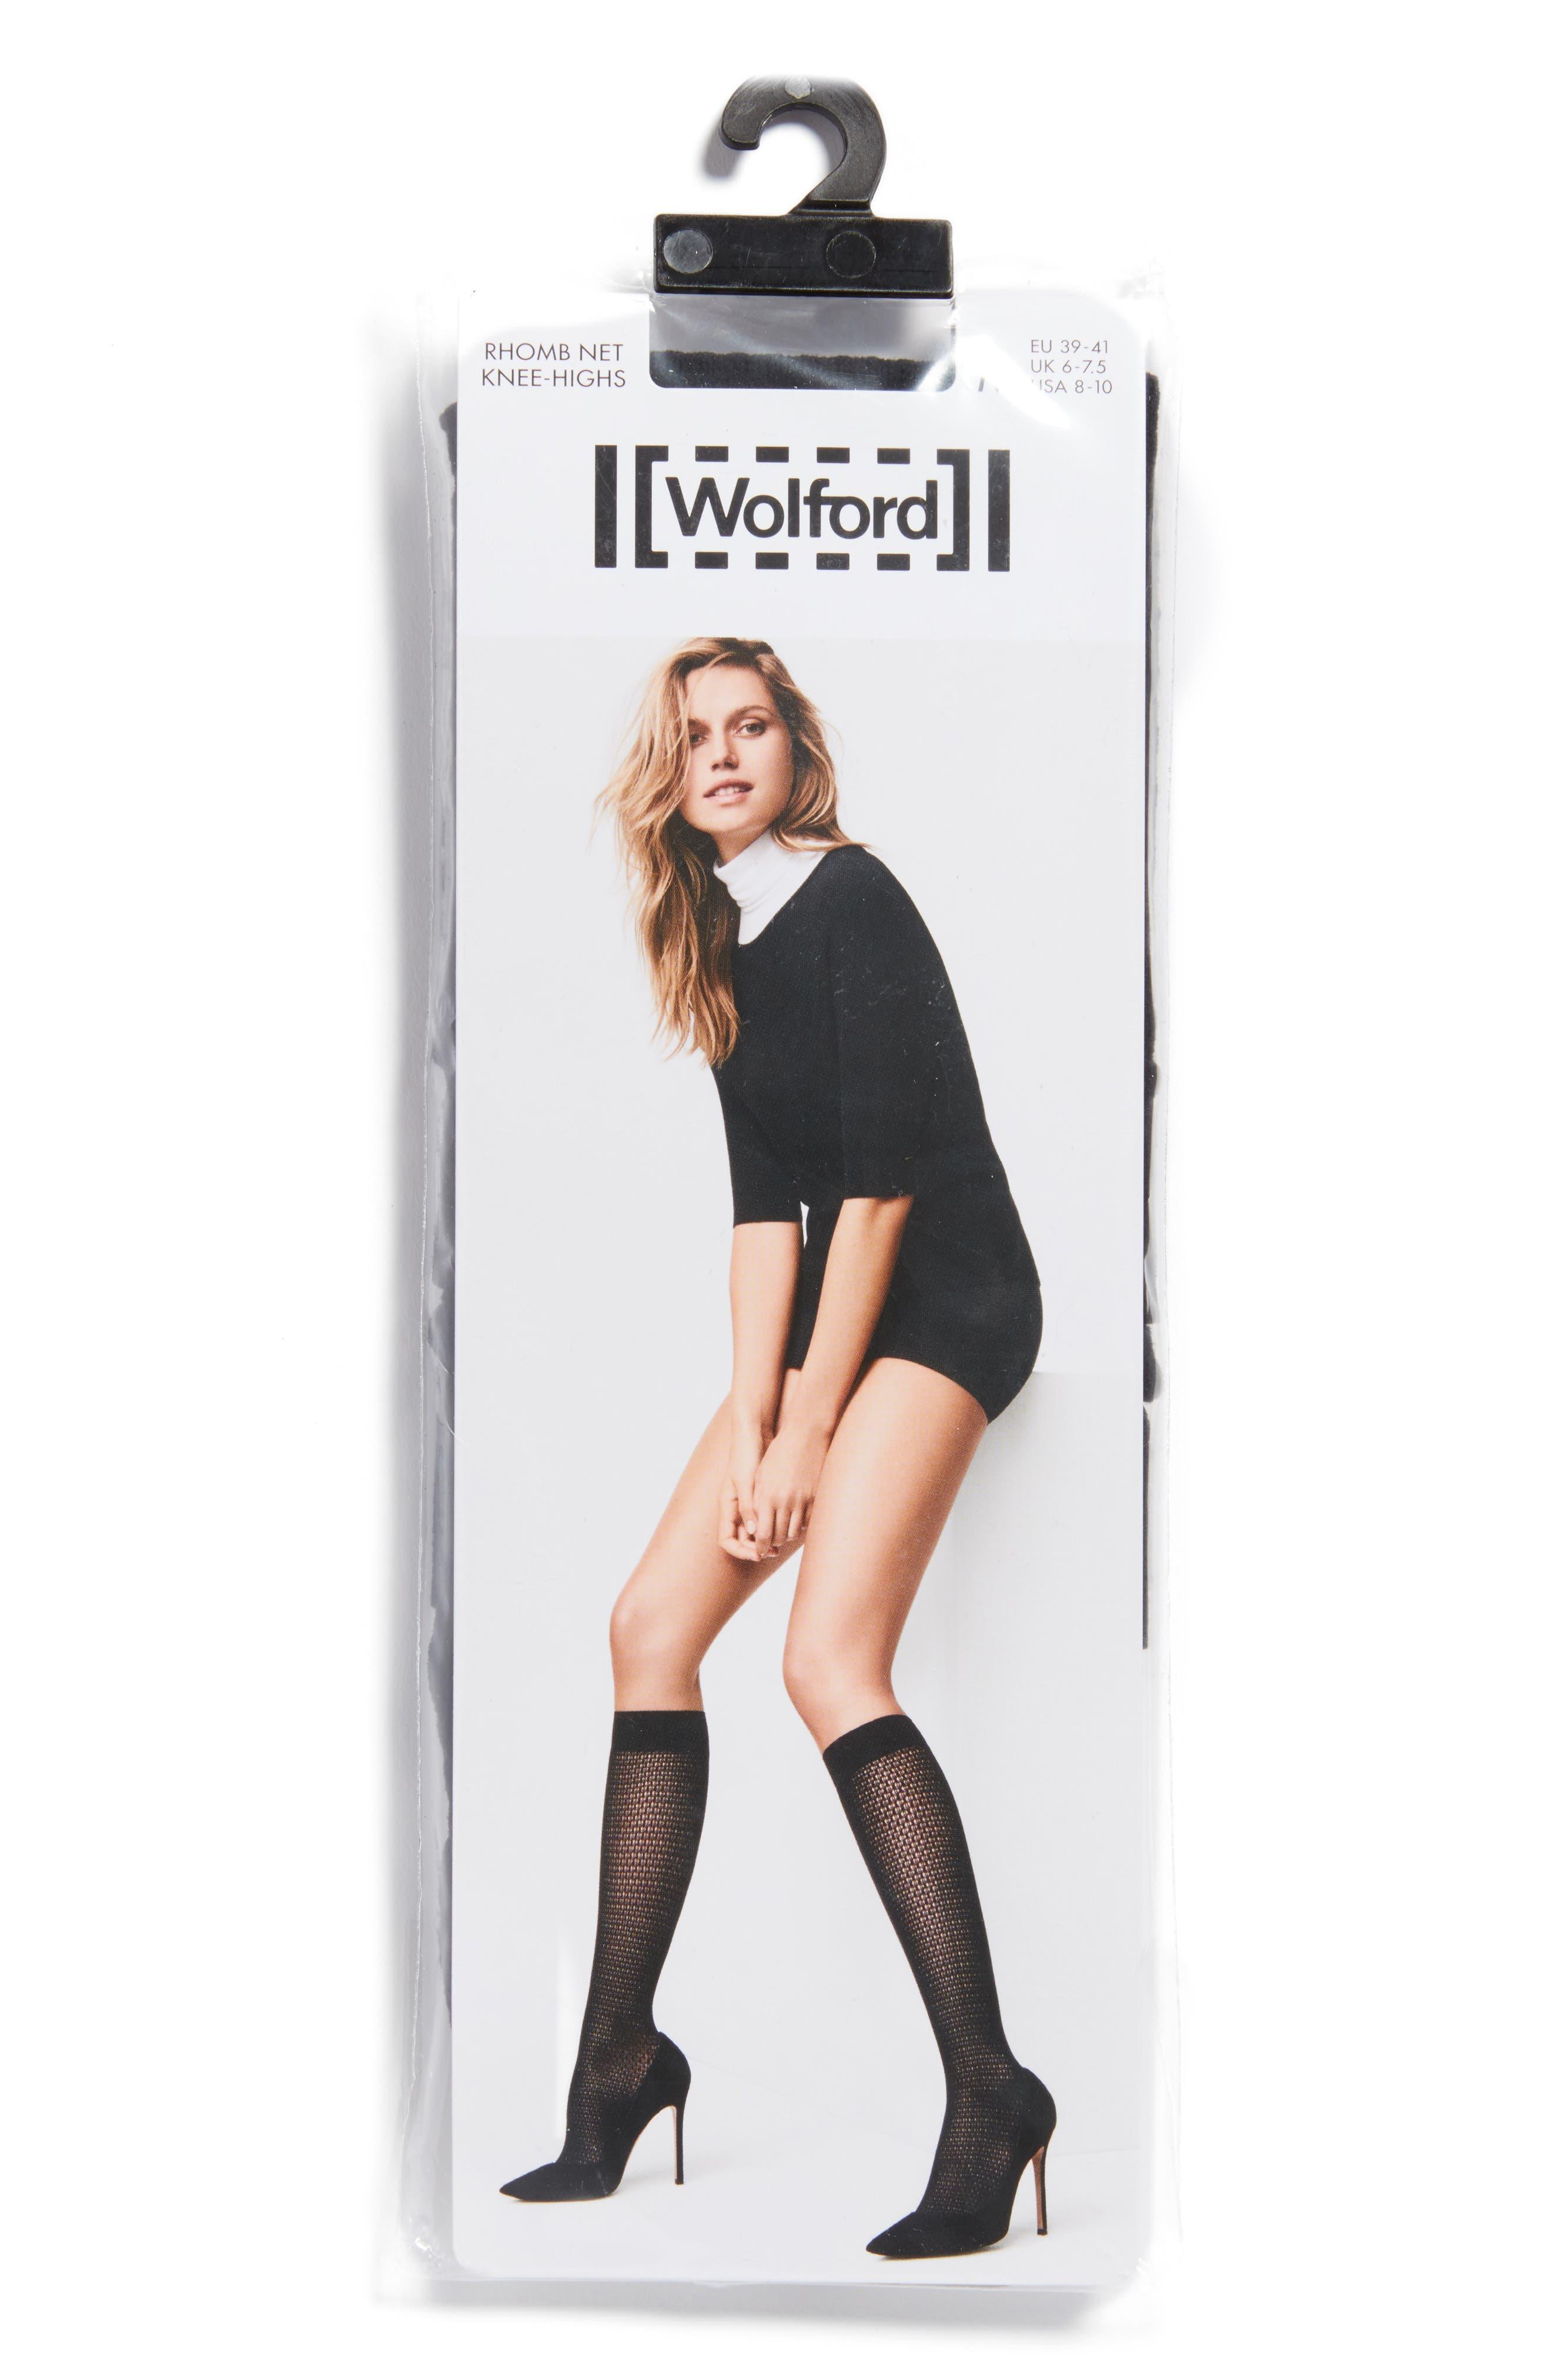 Alternate Image 2  - Wolford Rhomb Net Knee High Stockings